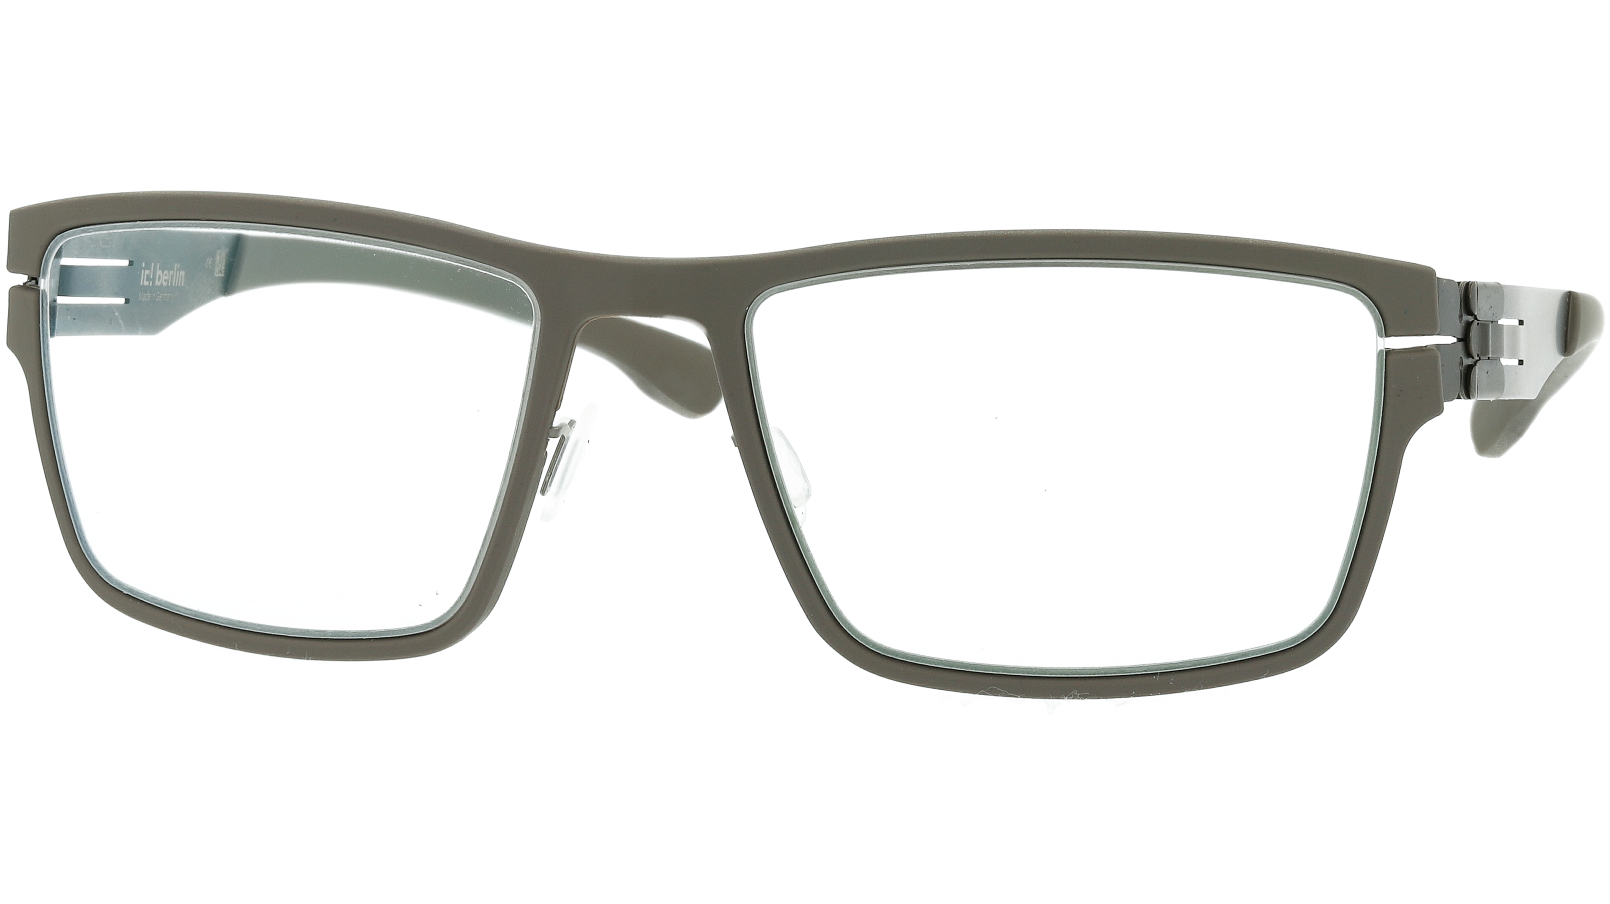 ic! berlin Phil B Graphite Grey Glasses Frame